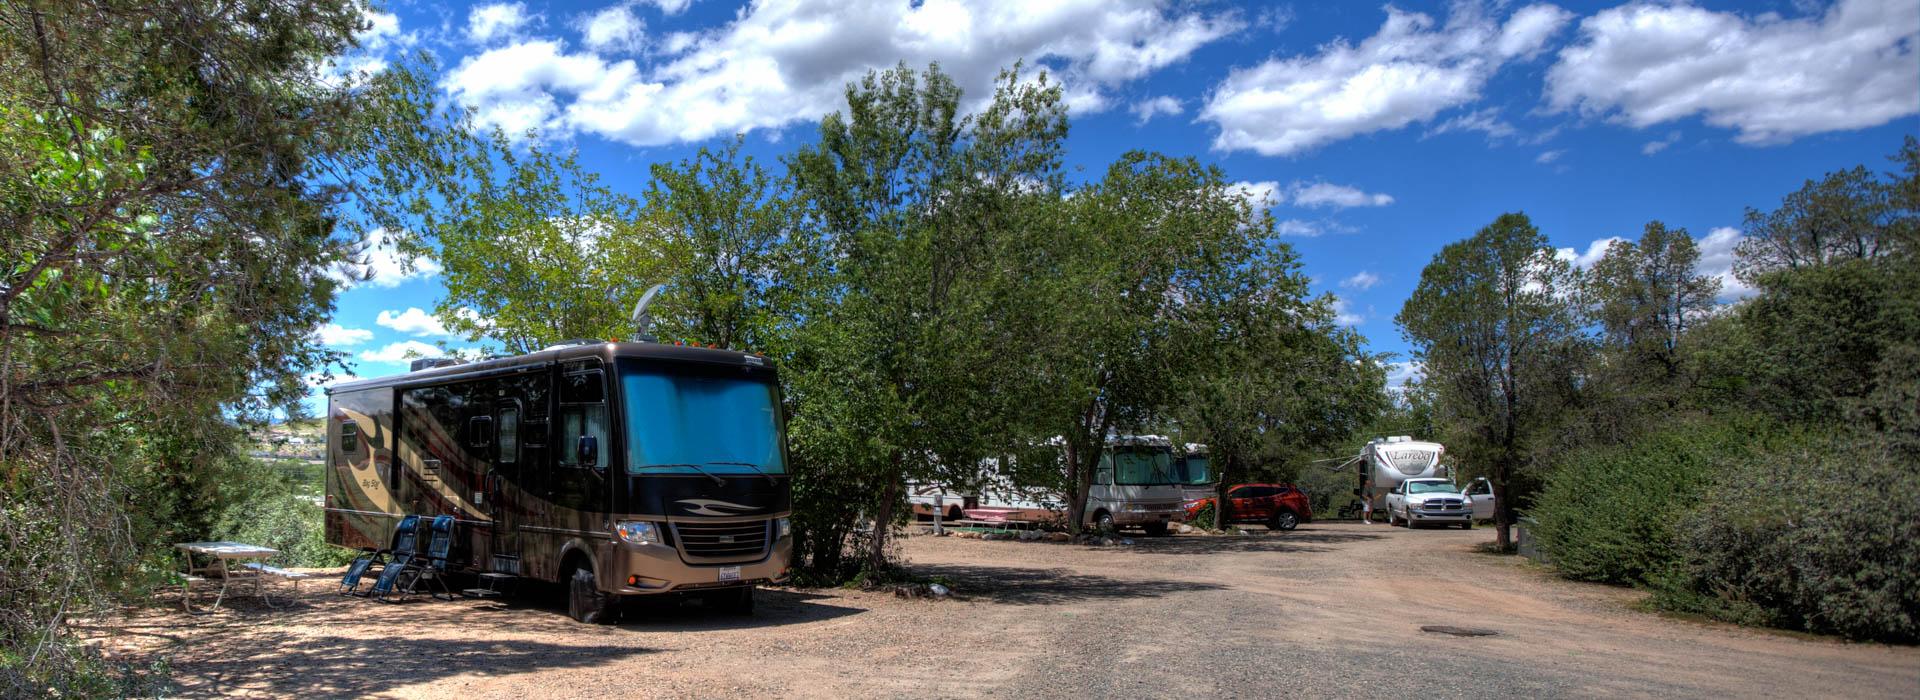 RV Camping Prescott AZ photographer Richard Charpentier